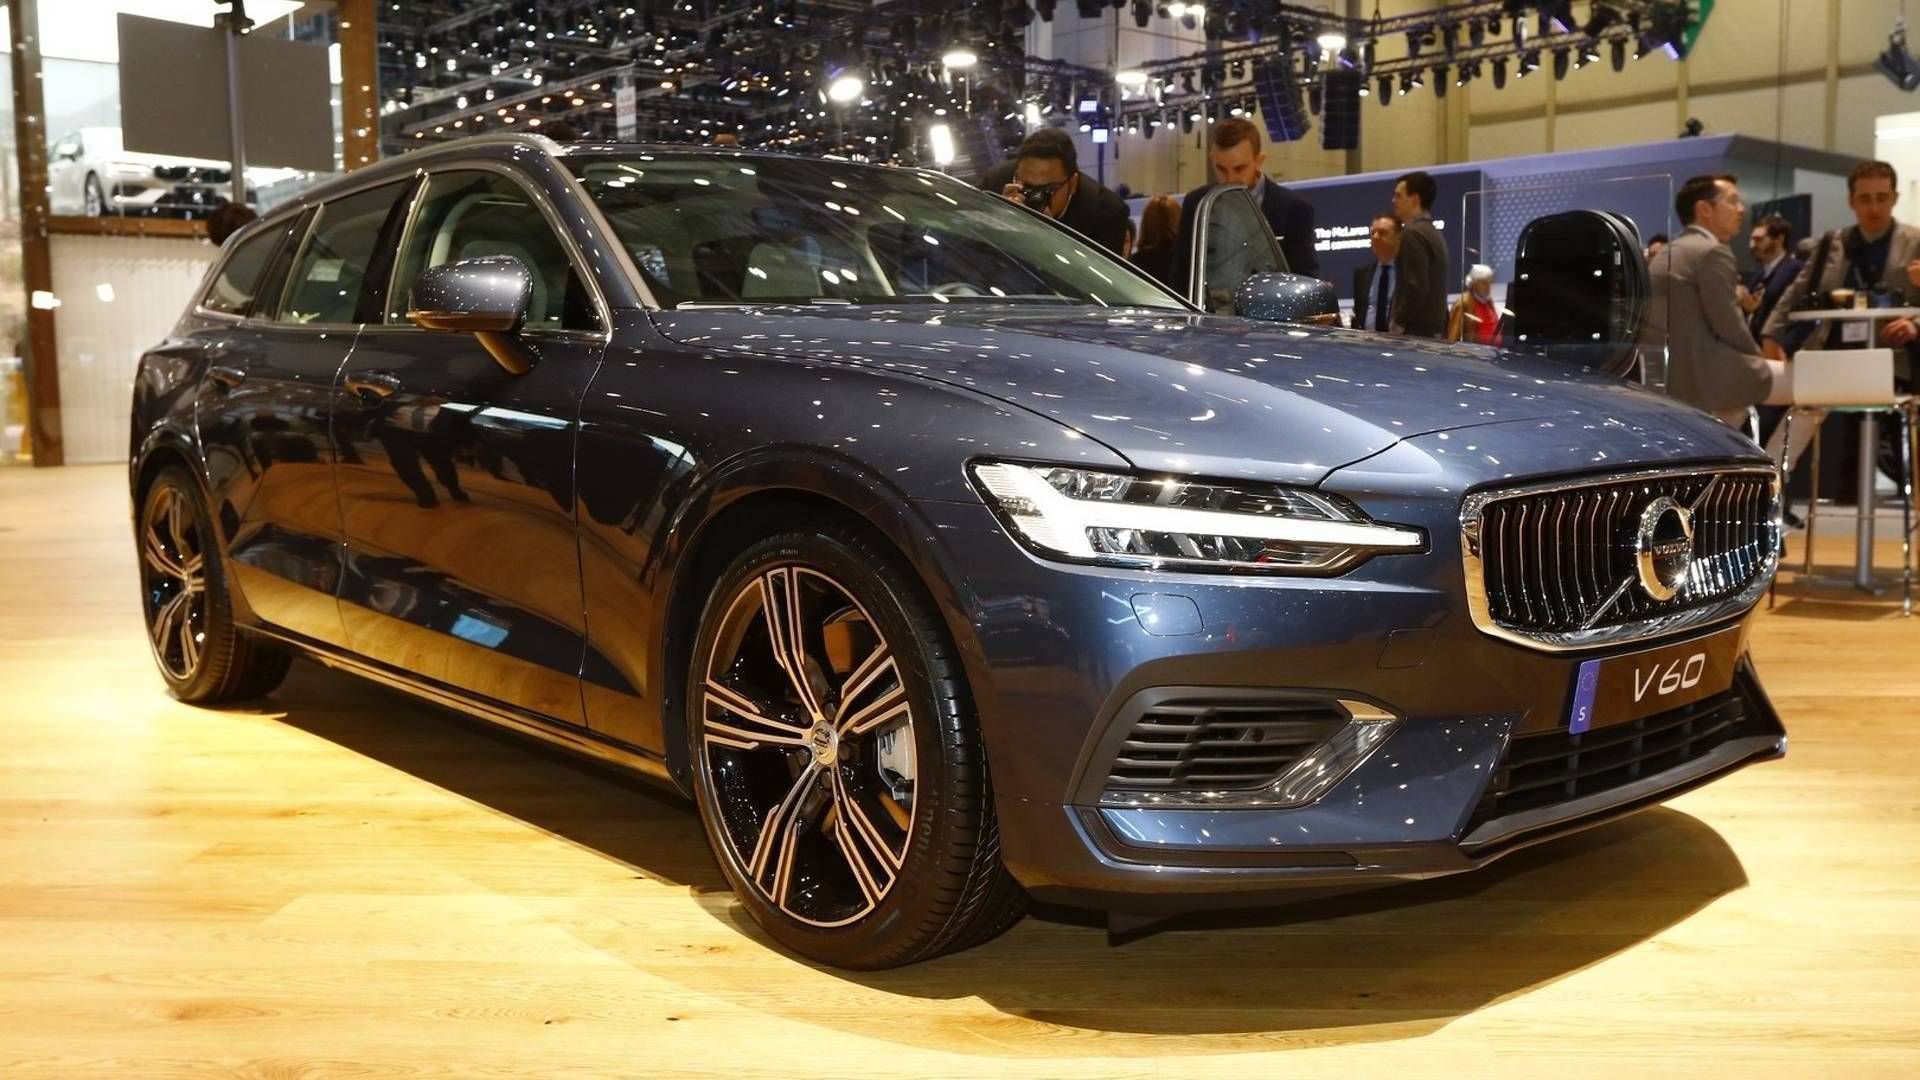 74 Best Review Volvo Open 2019 Specs for Volvo Open 2019